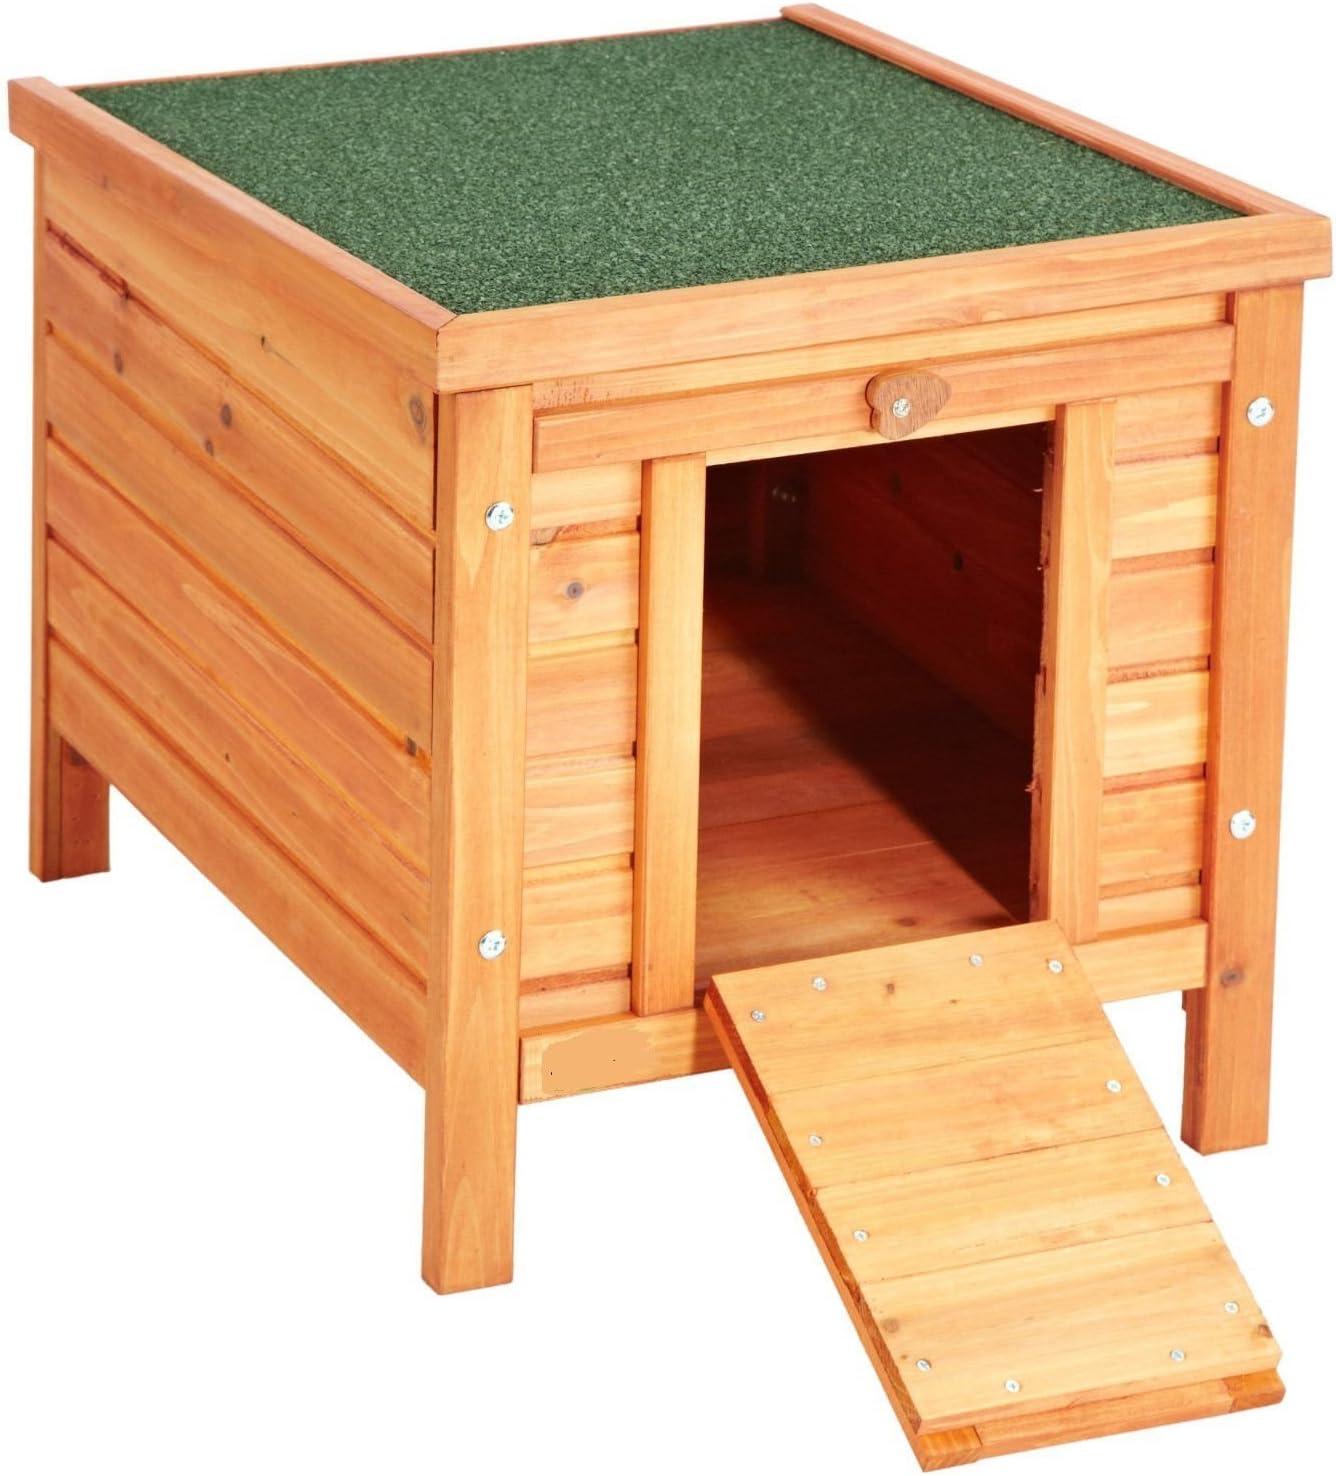 VivaPet Gato/Perro/Conejo/Guinea Pig de Madera Hide casa – 50cm (L) x 42cm (W) x 43cm (H)